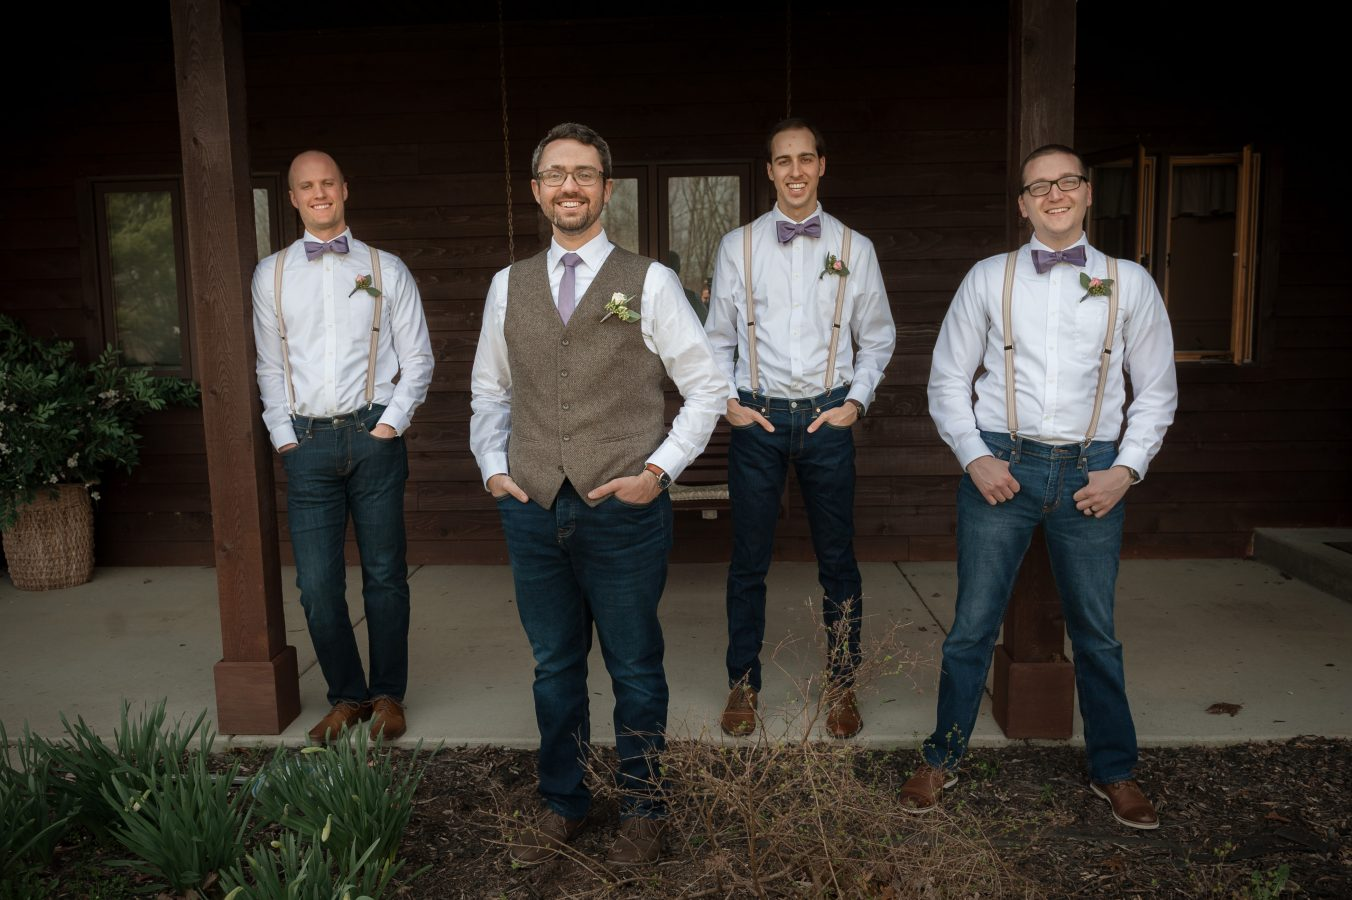 Marriage_Photography__Bride_Groom_wedding_Athens_Ohio_OH_lifestyle_documentary-10